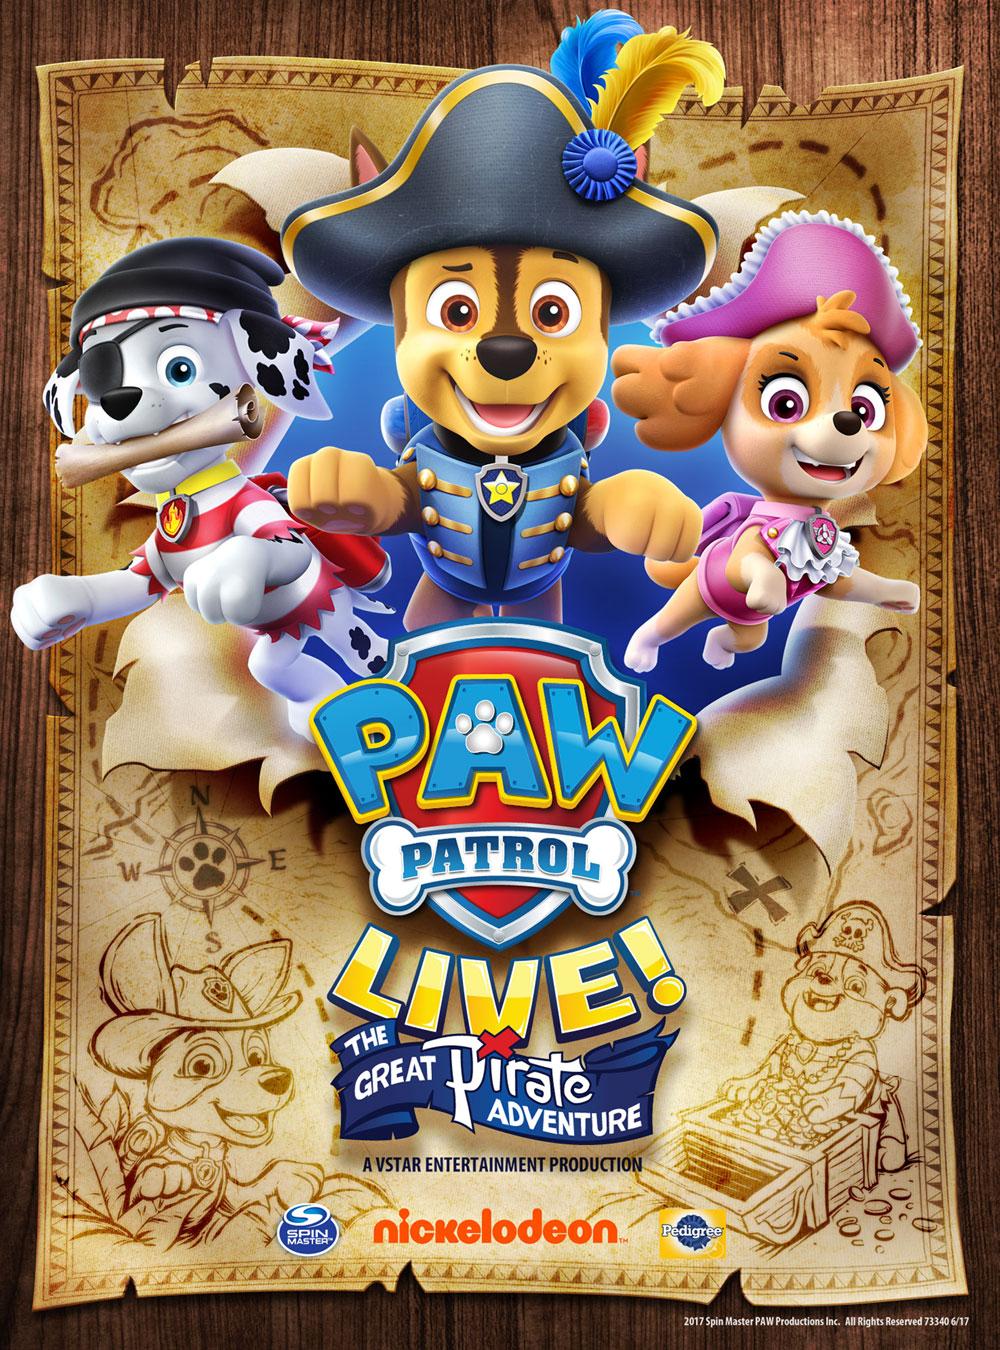 Paw_Patrol_Live_Great_Pirate_Adventure_DVD.jpg